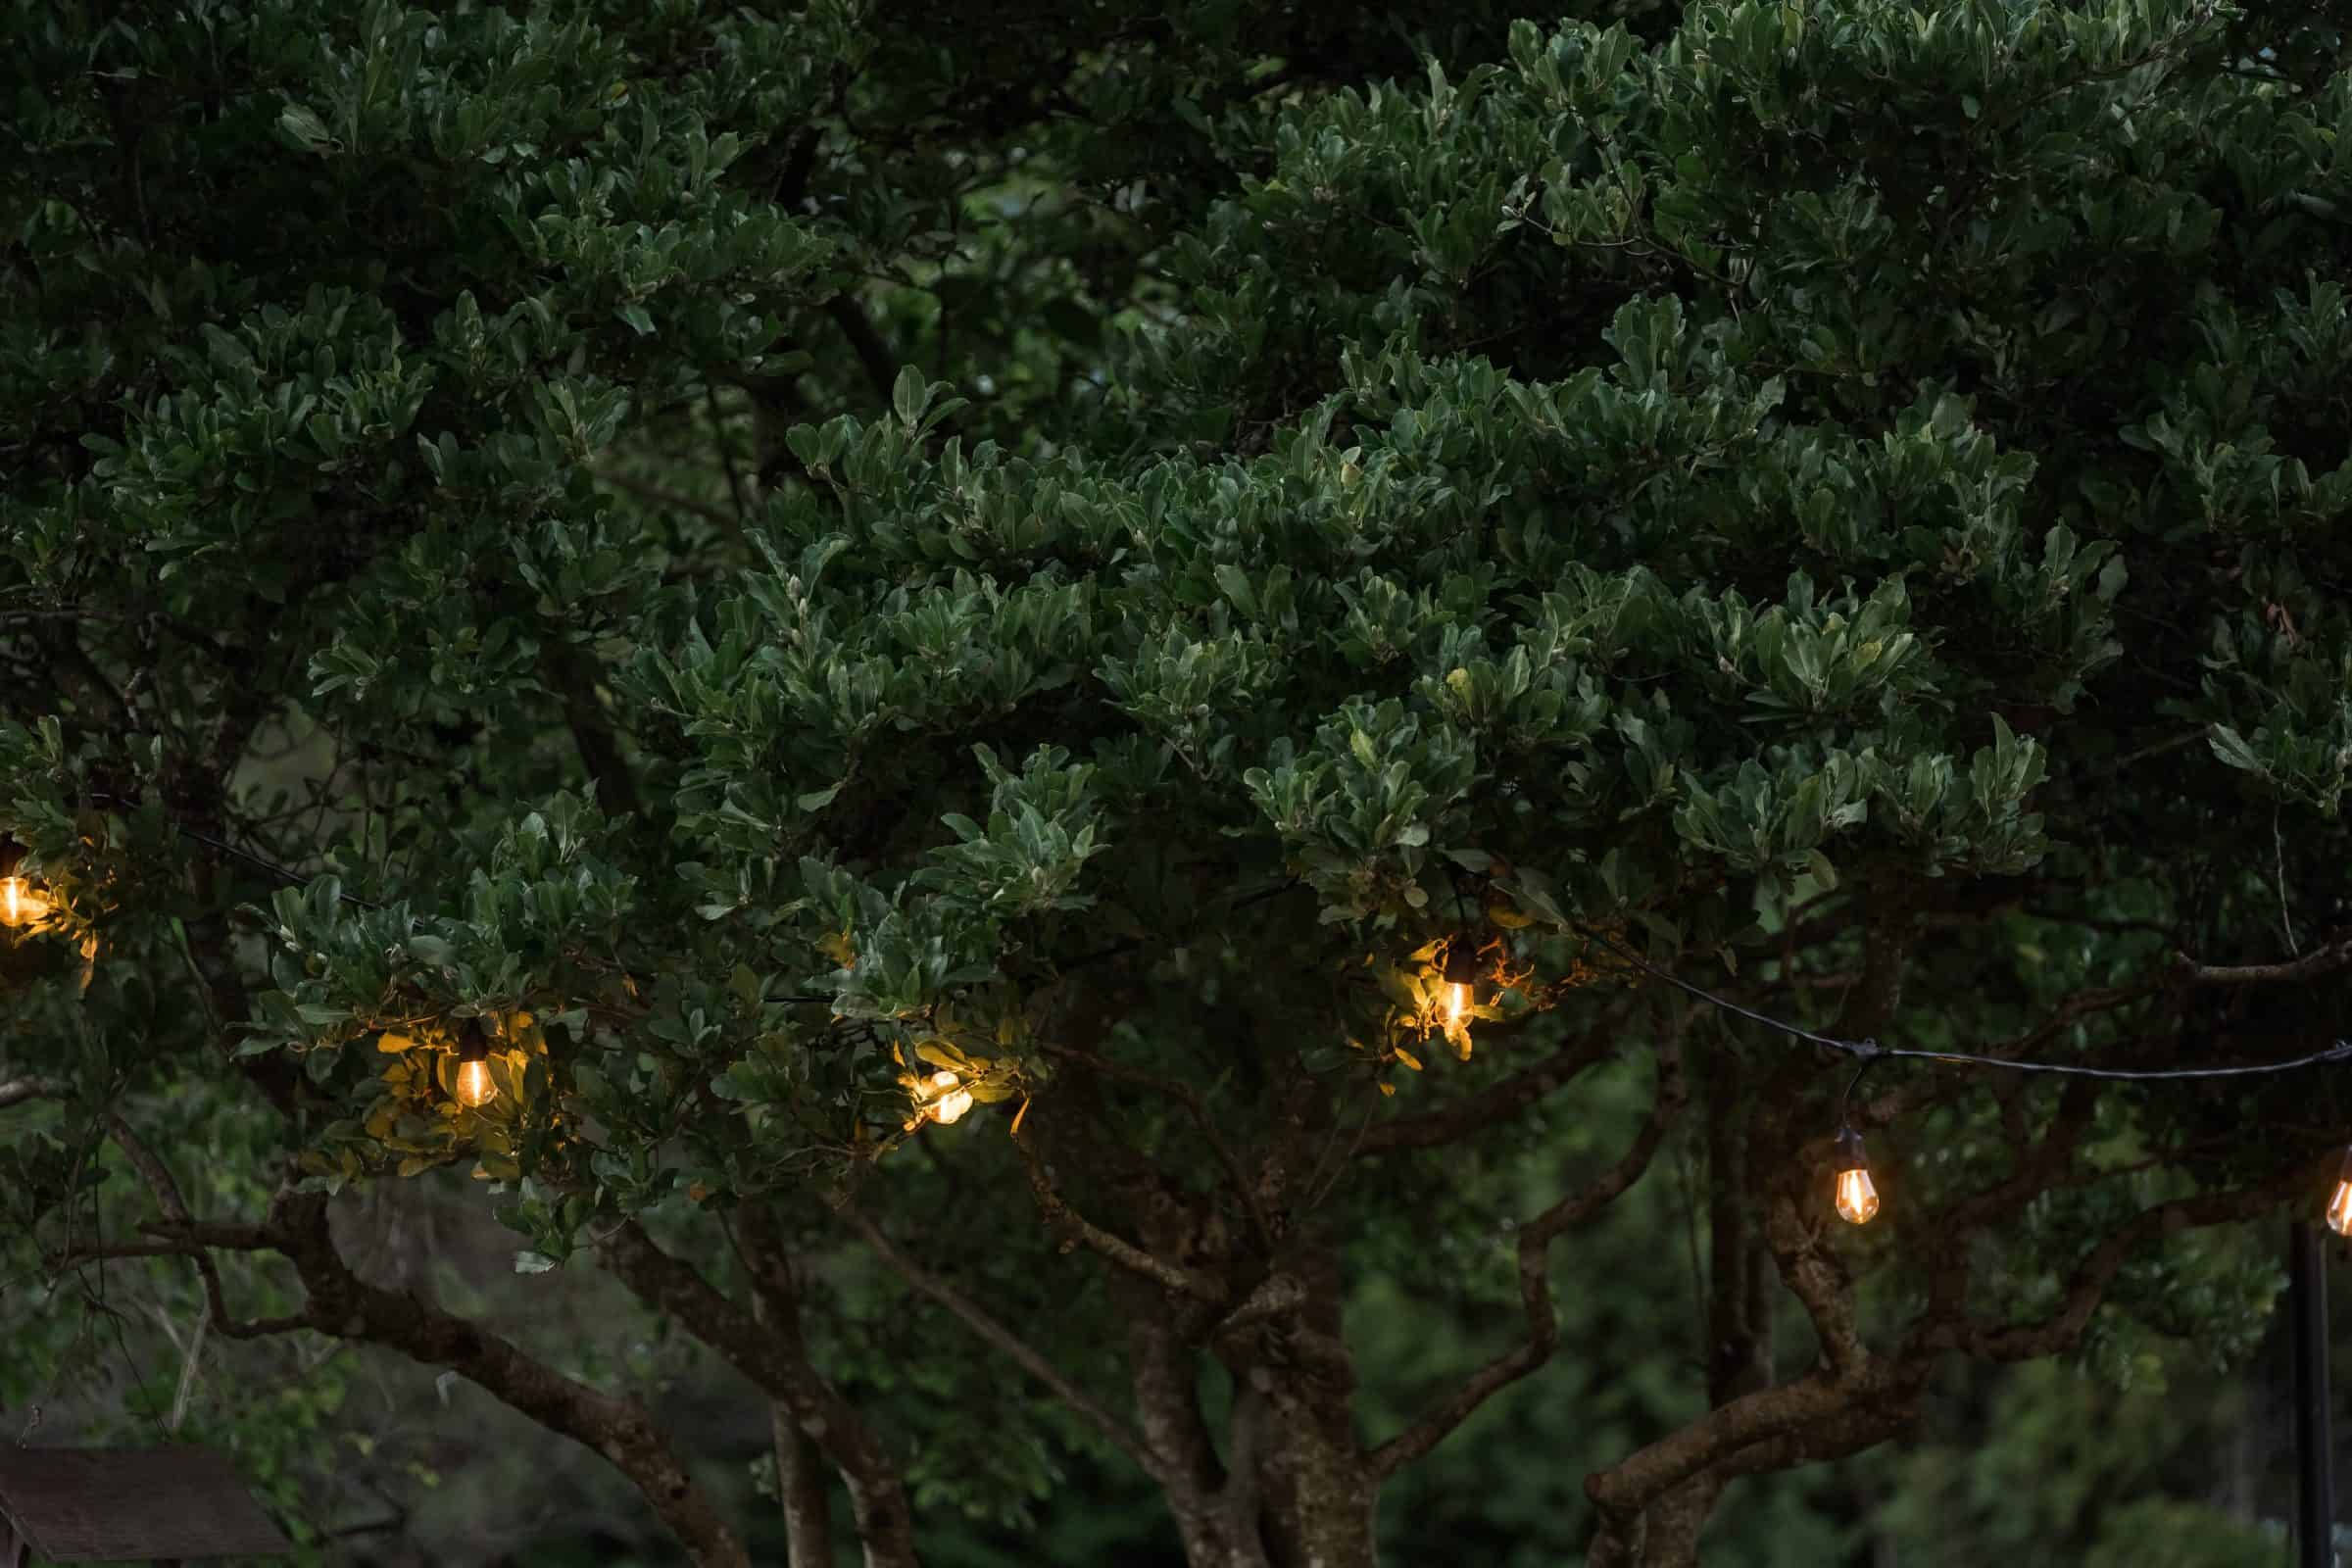 eddison lights strung up in trees